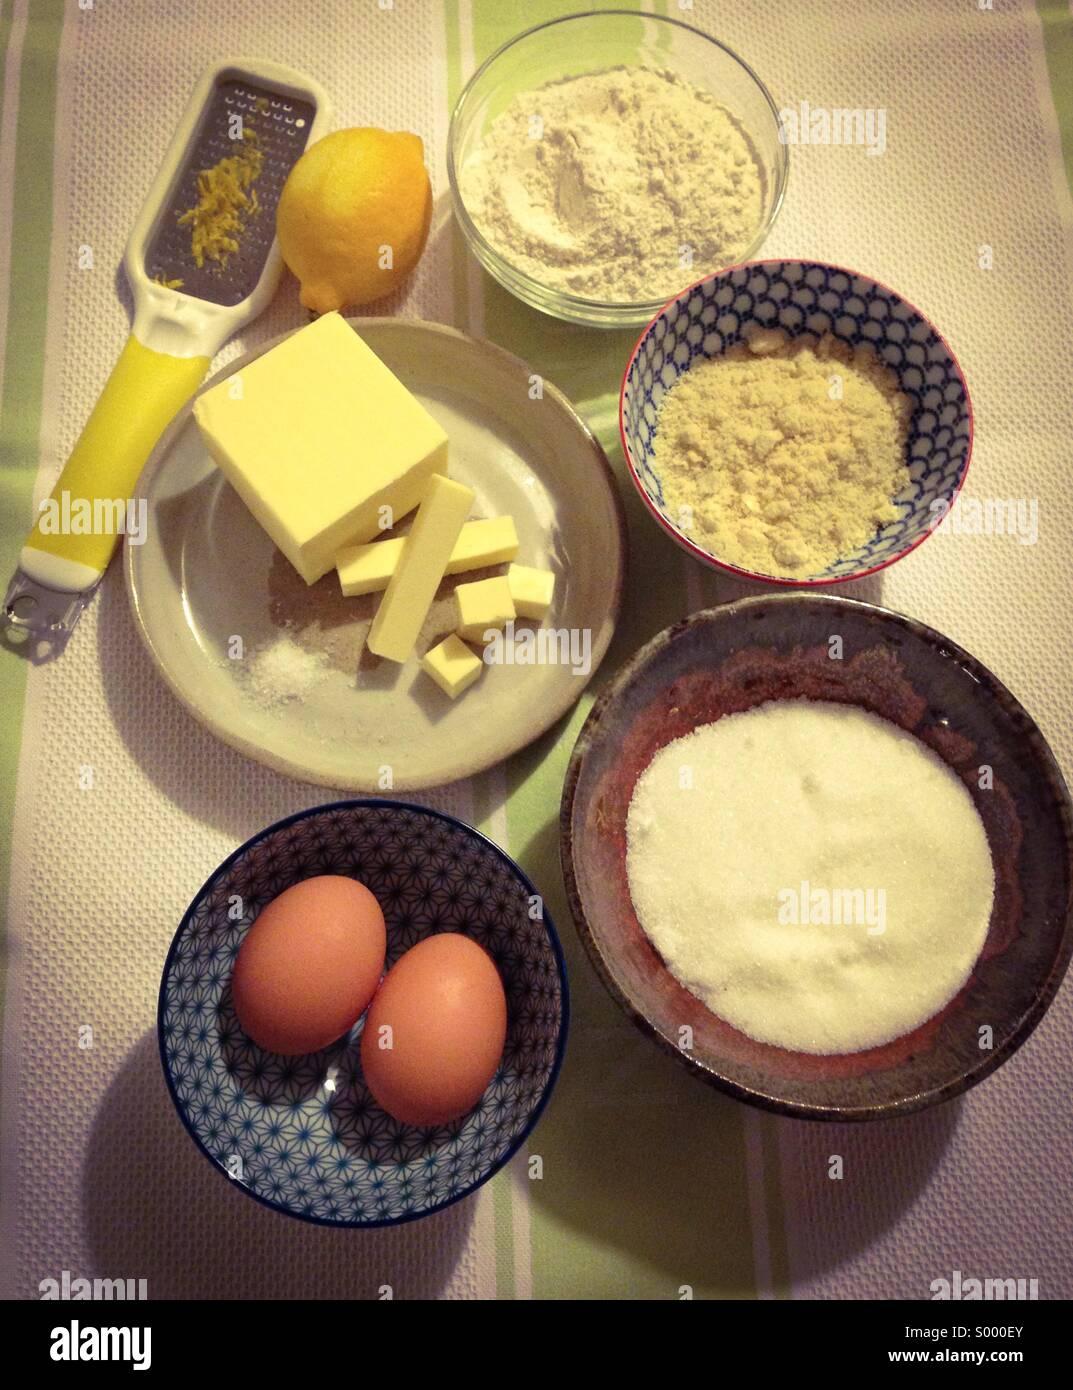 Shortcrust pastry ingredients - Stock Image